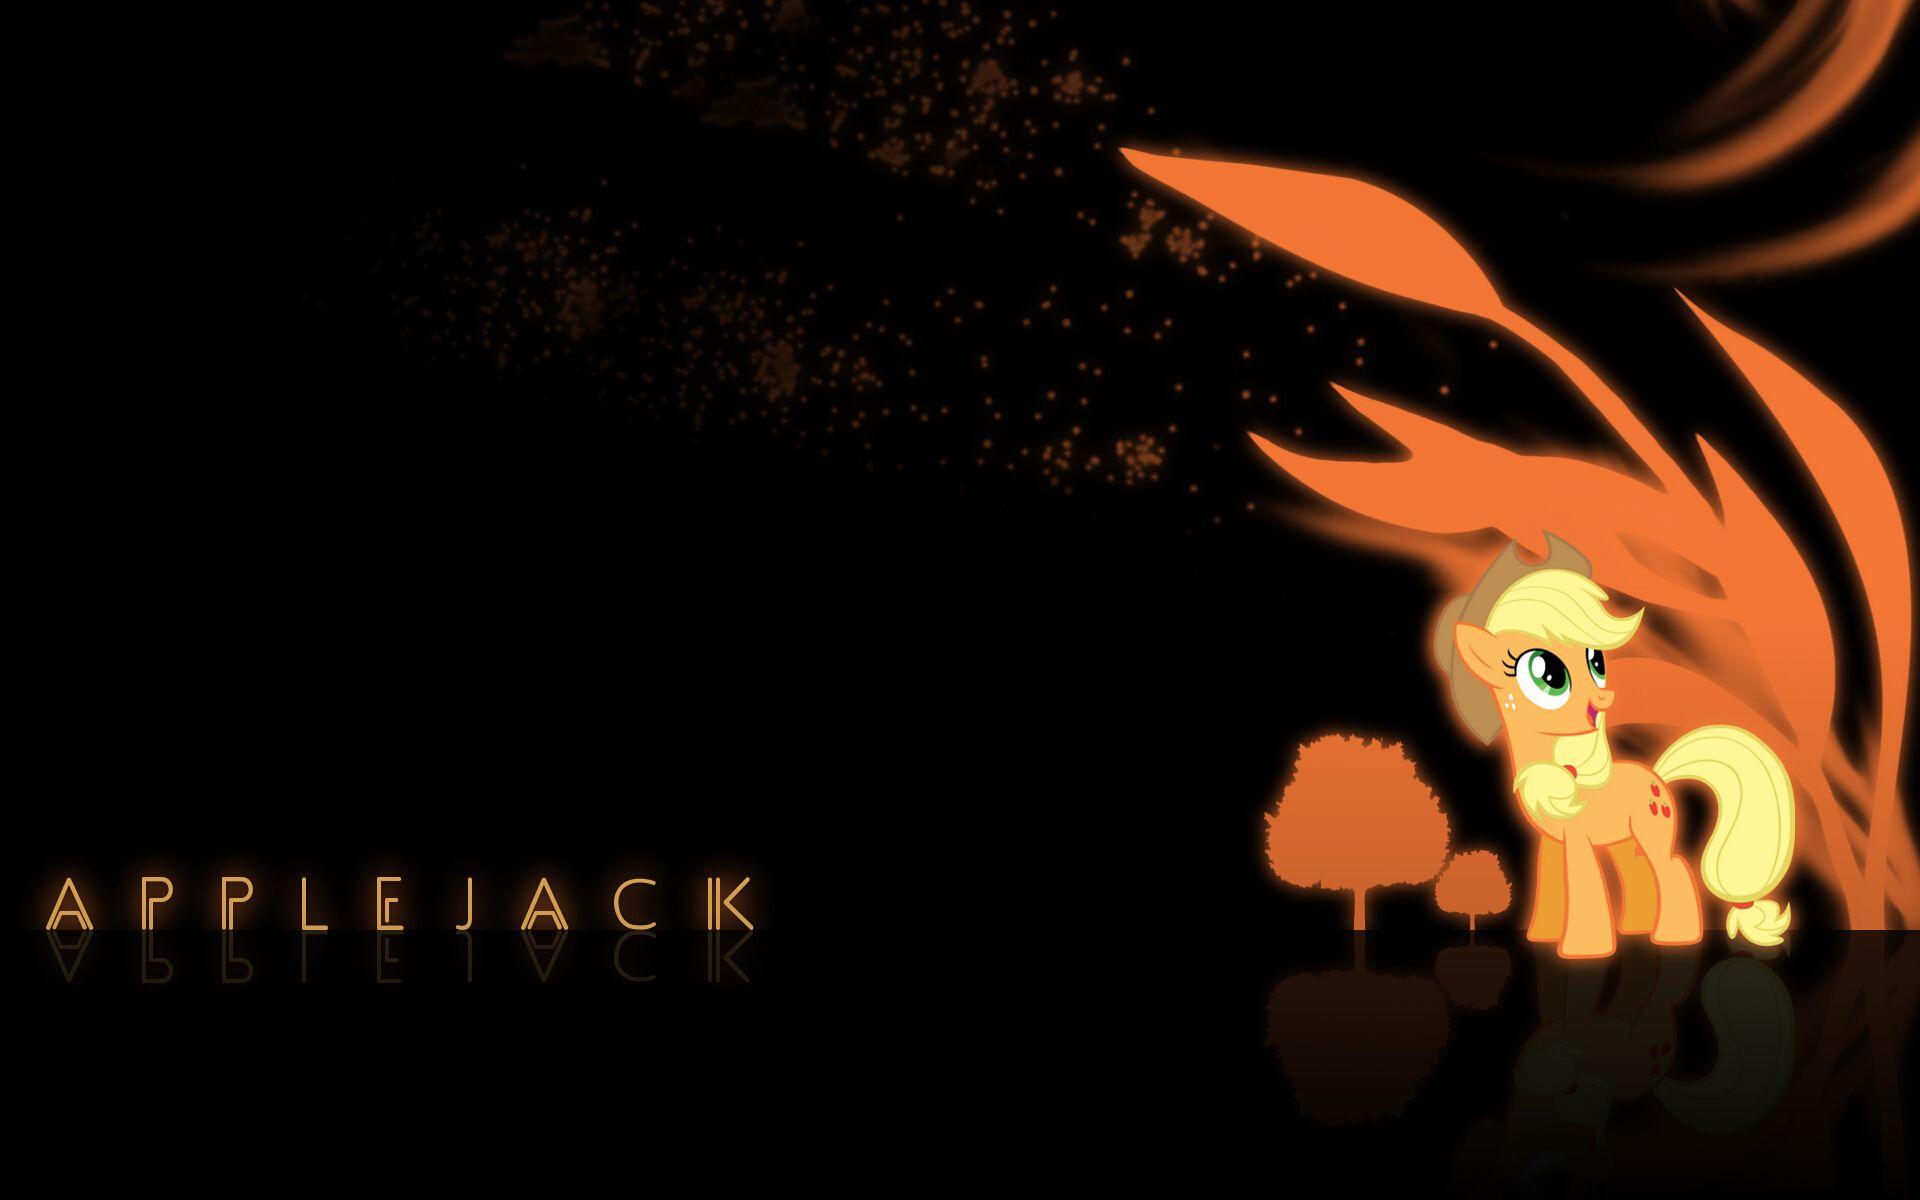 applejack background Applejack wallpaper tehnomad   554233 1920x1200